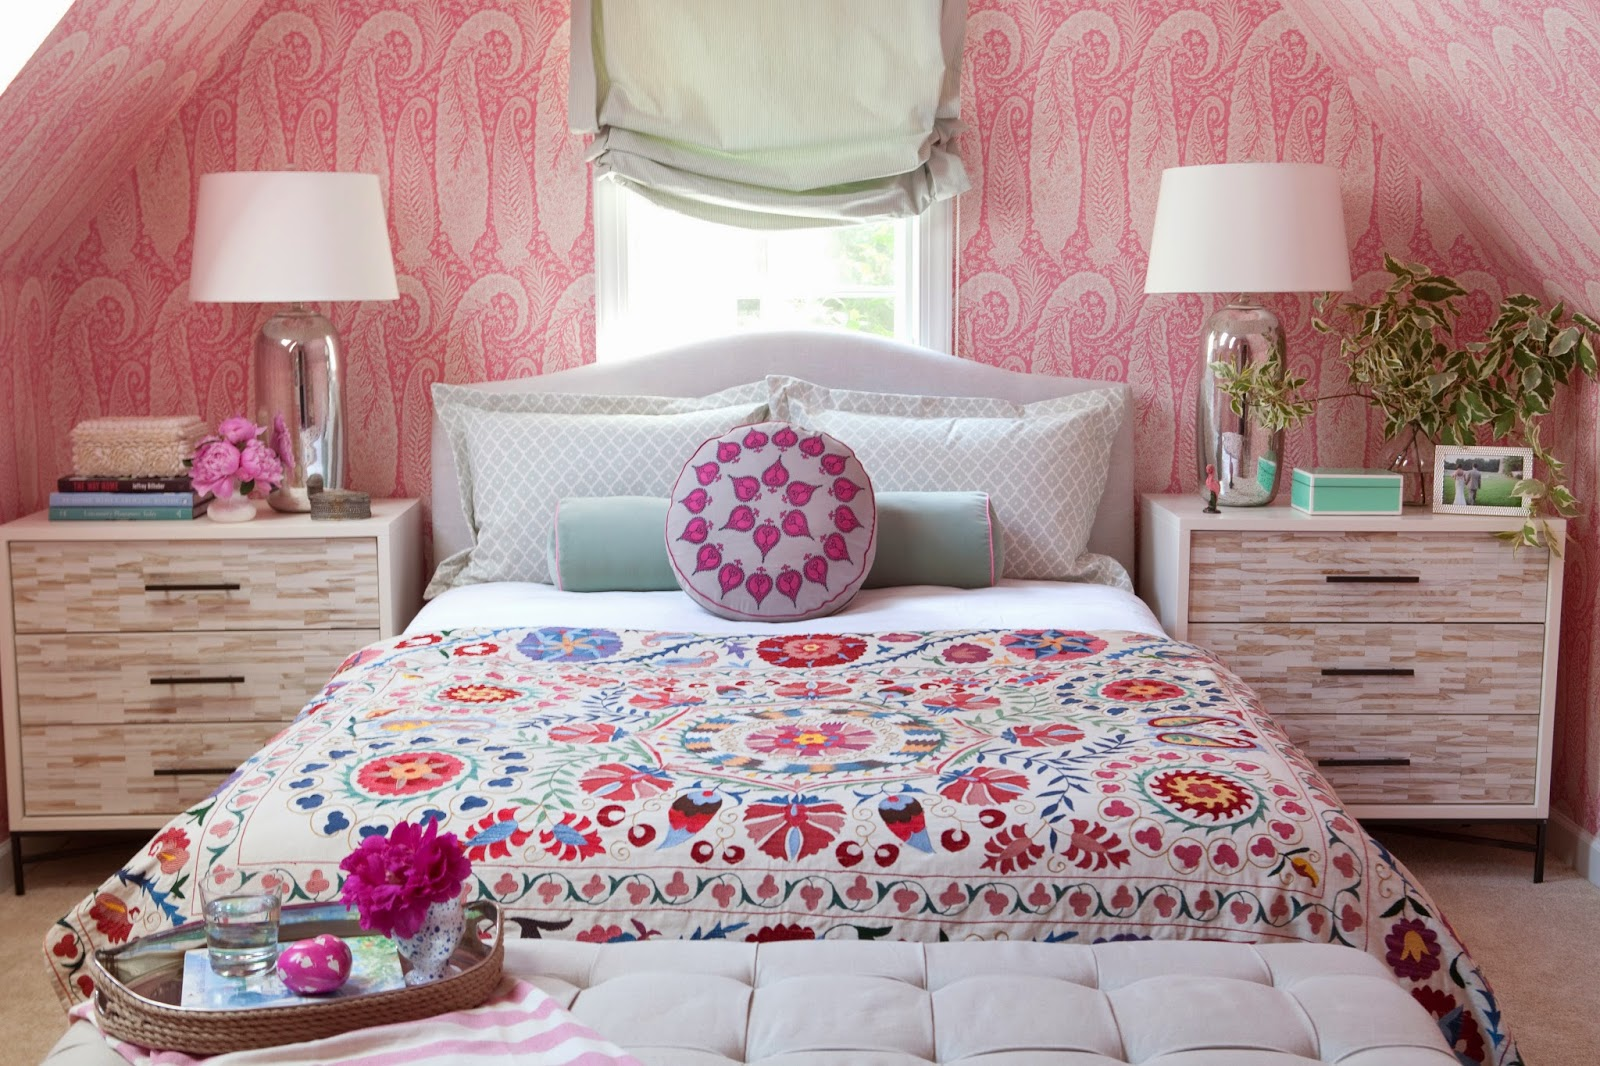 eclectic bohemian girl room ideas